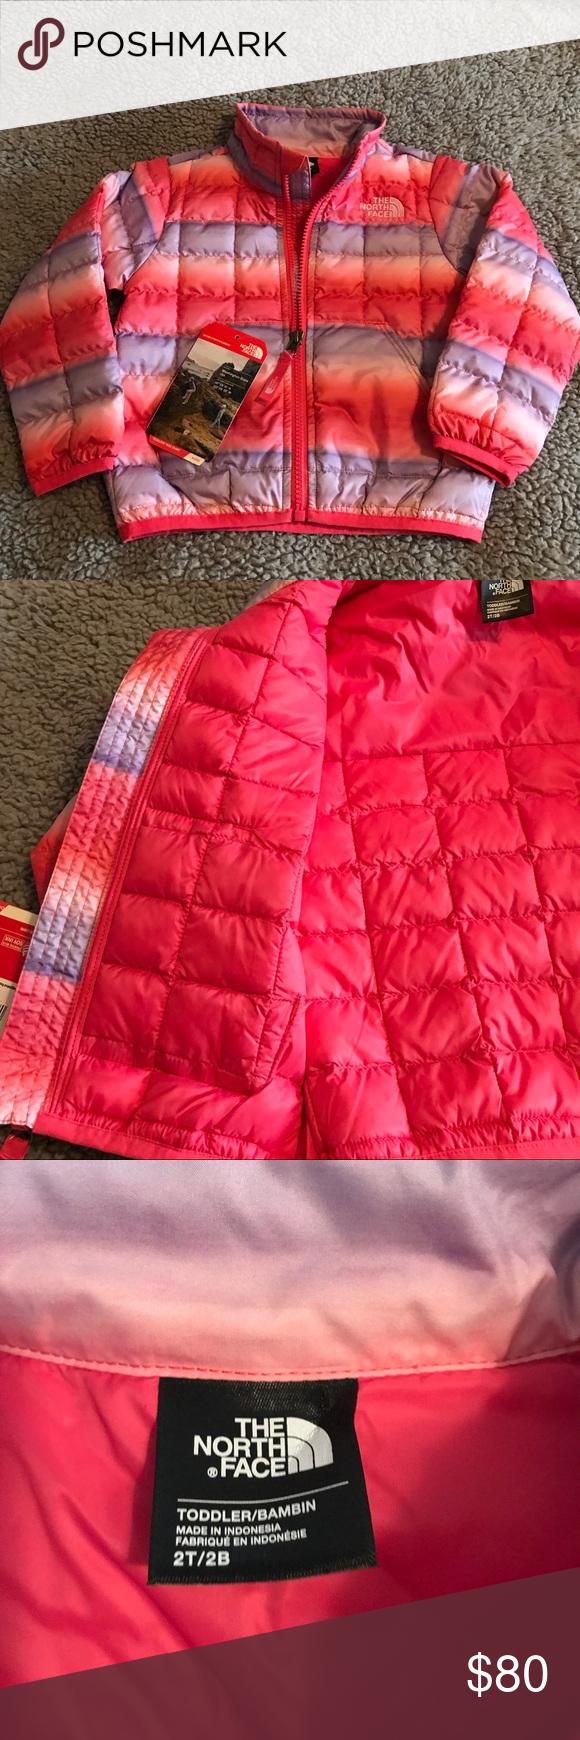 Size 2T  girls NorthFace Jacket Toddler girl size 2T NorthFace jacket. Really cute, warm jacket🎀 North Face Jackets & Coats Puffers